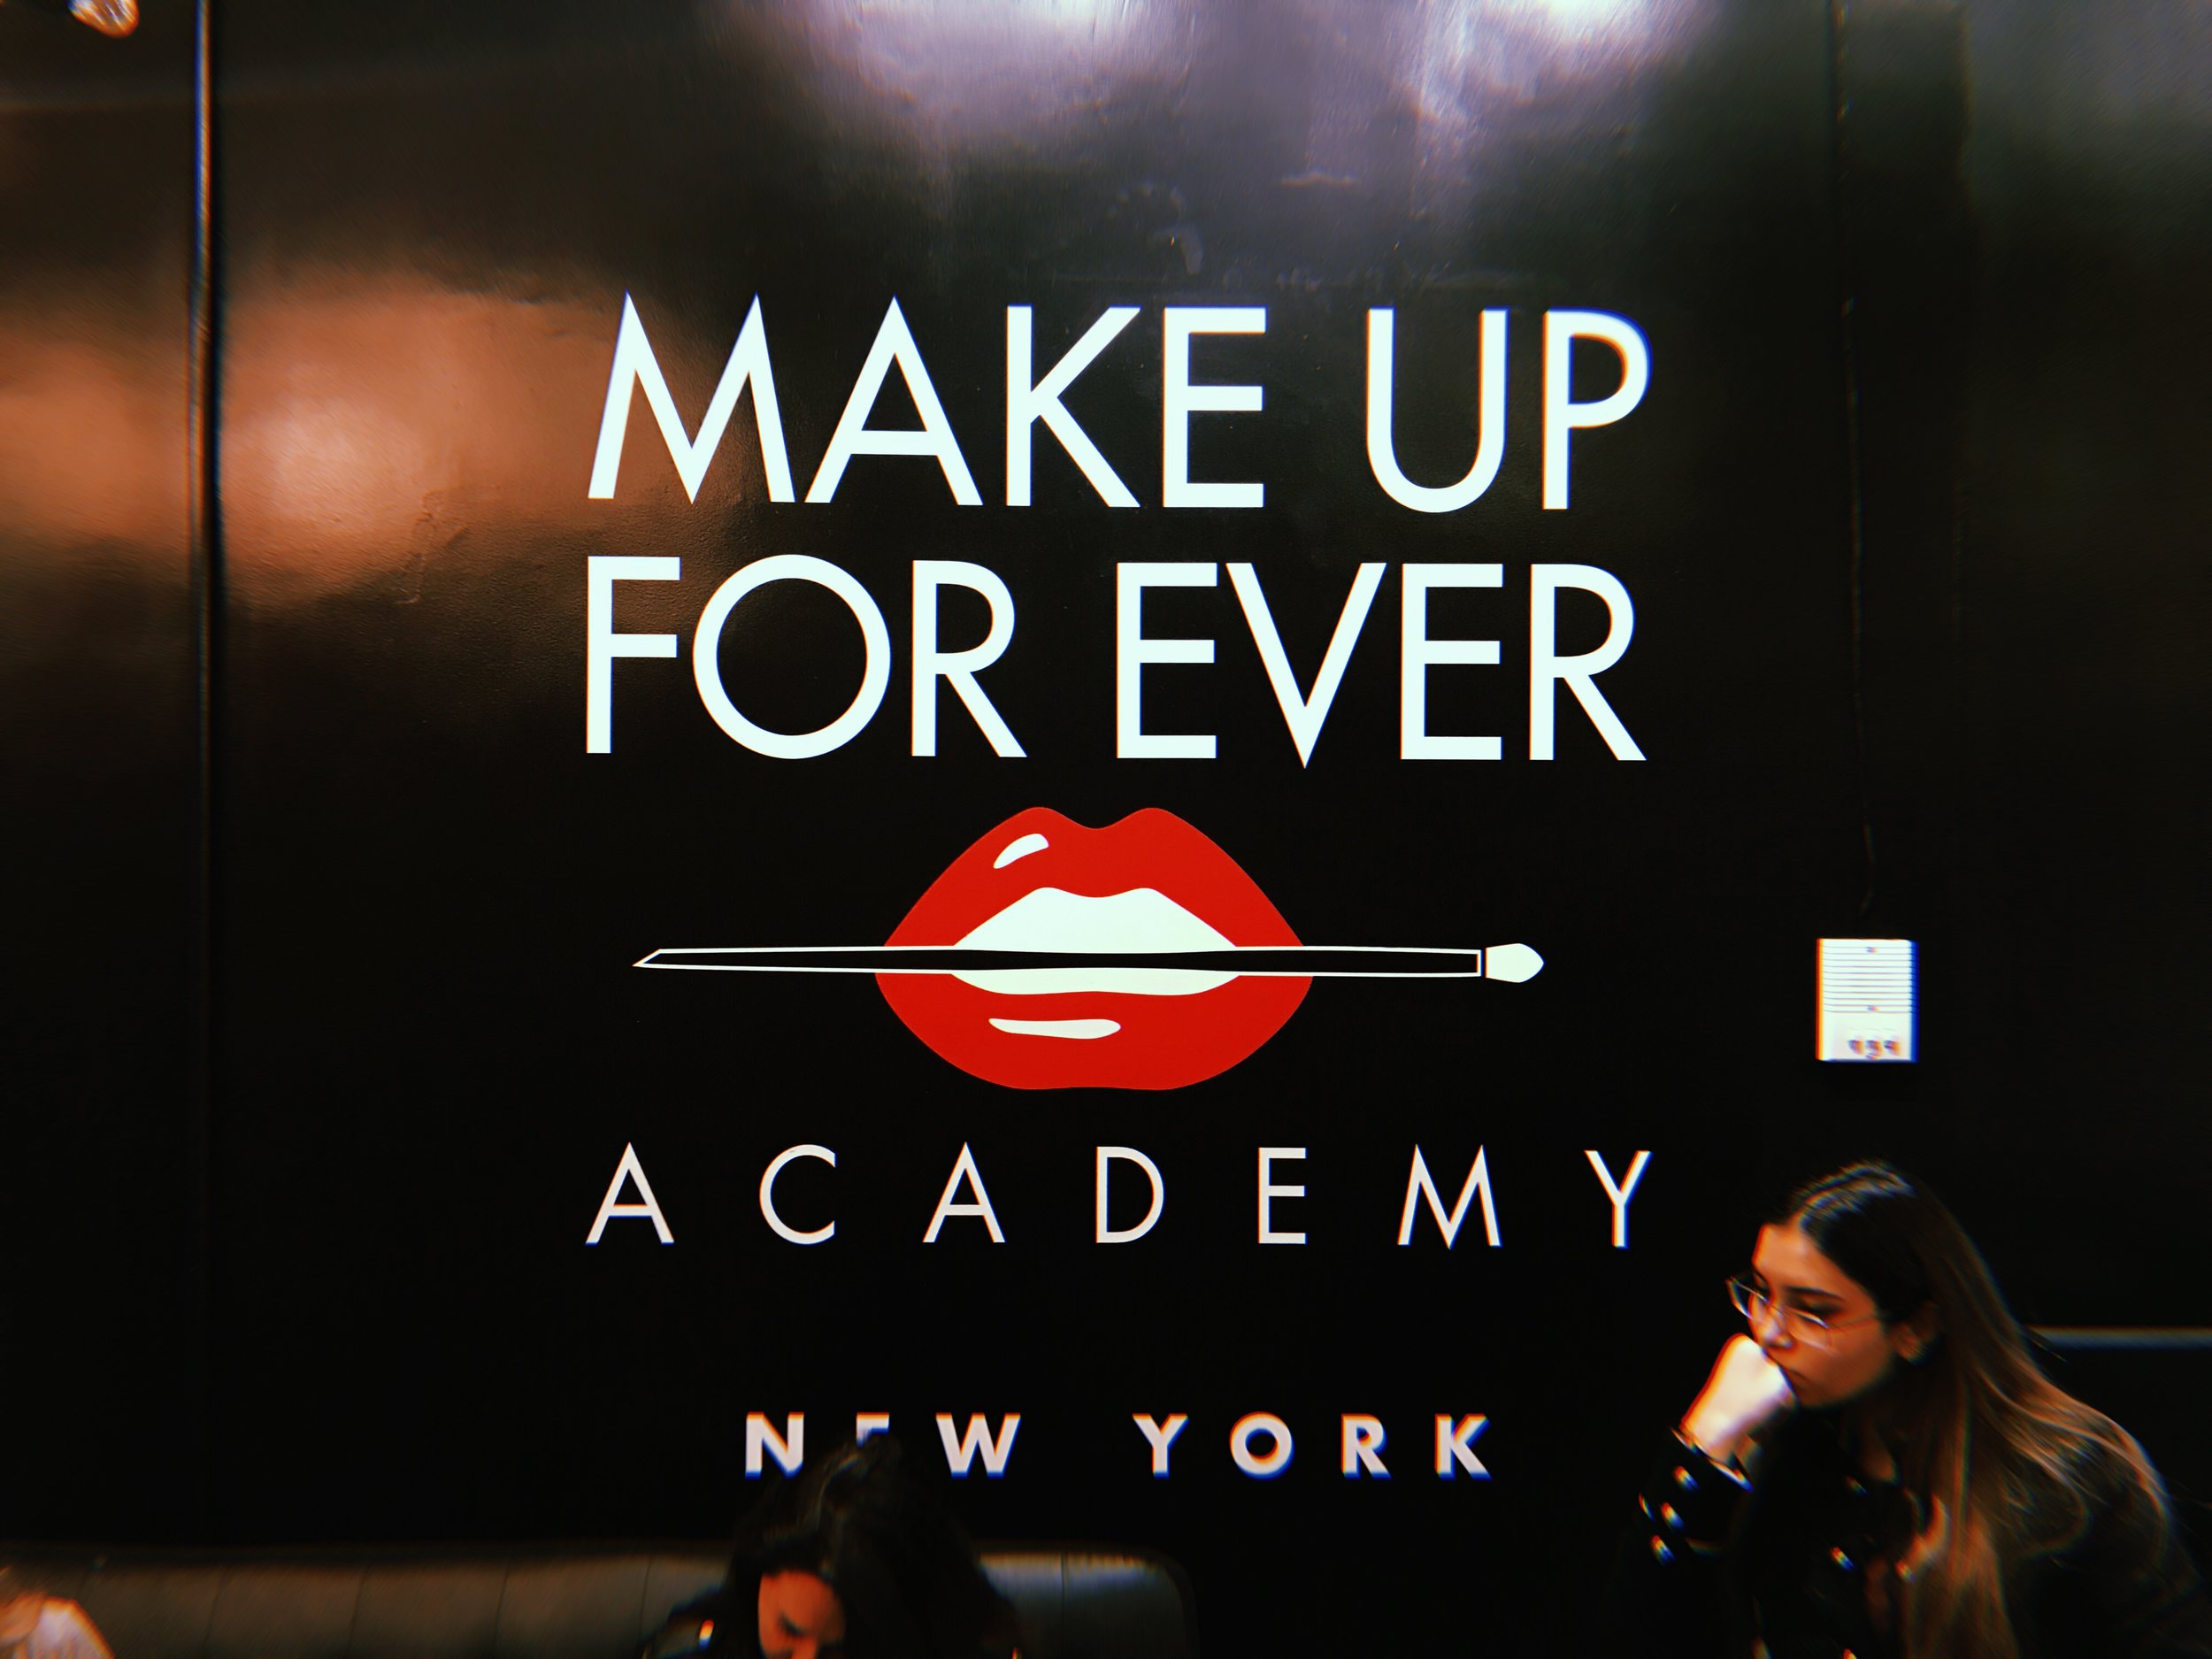 Make Up For Ever Academy, New York - Lobby